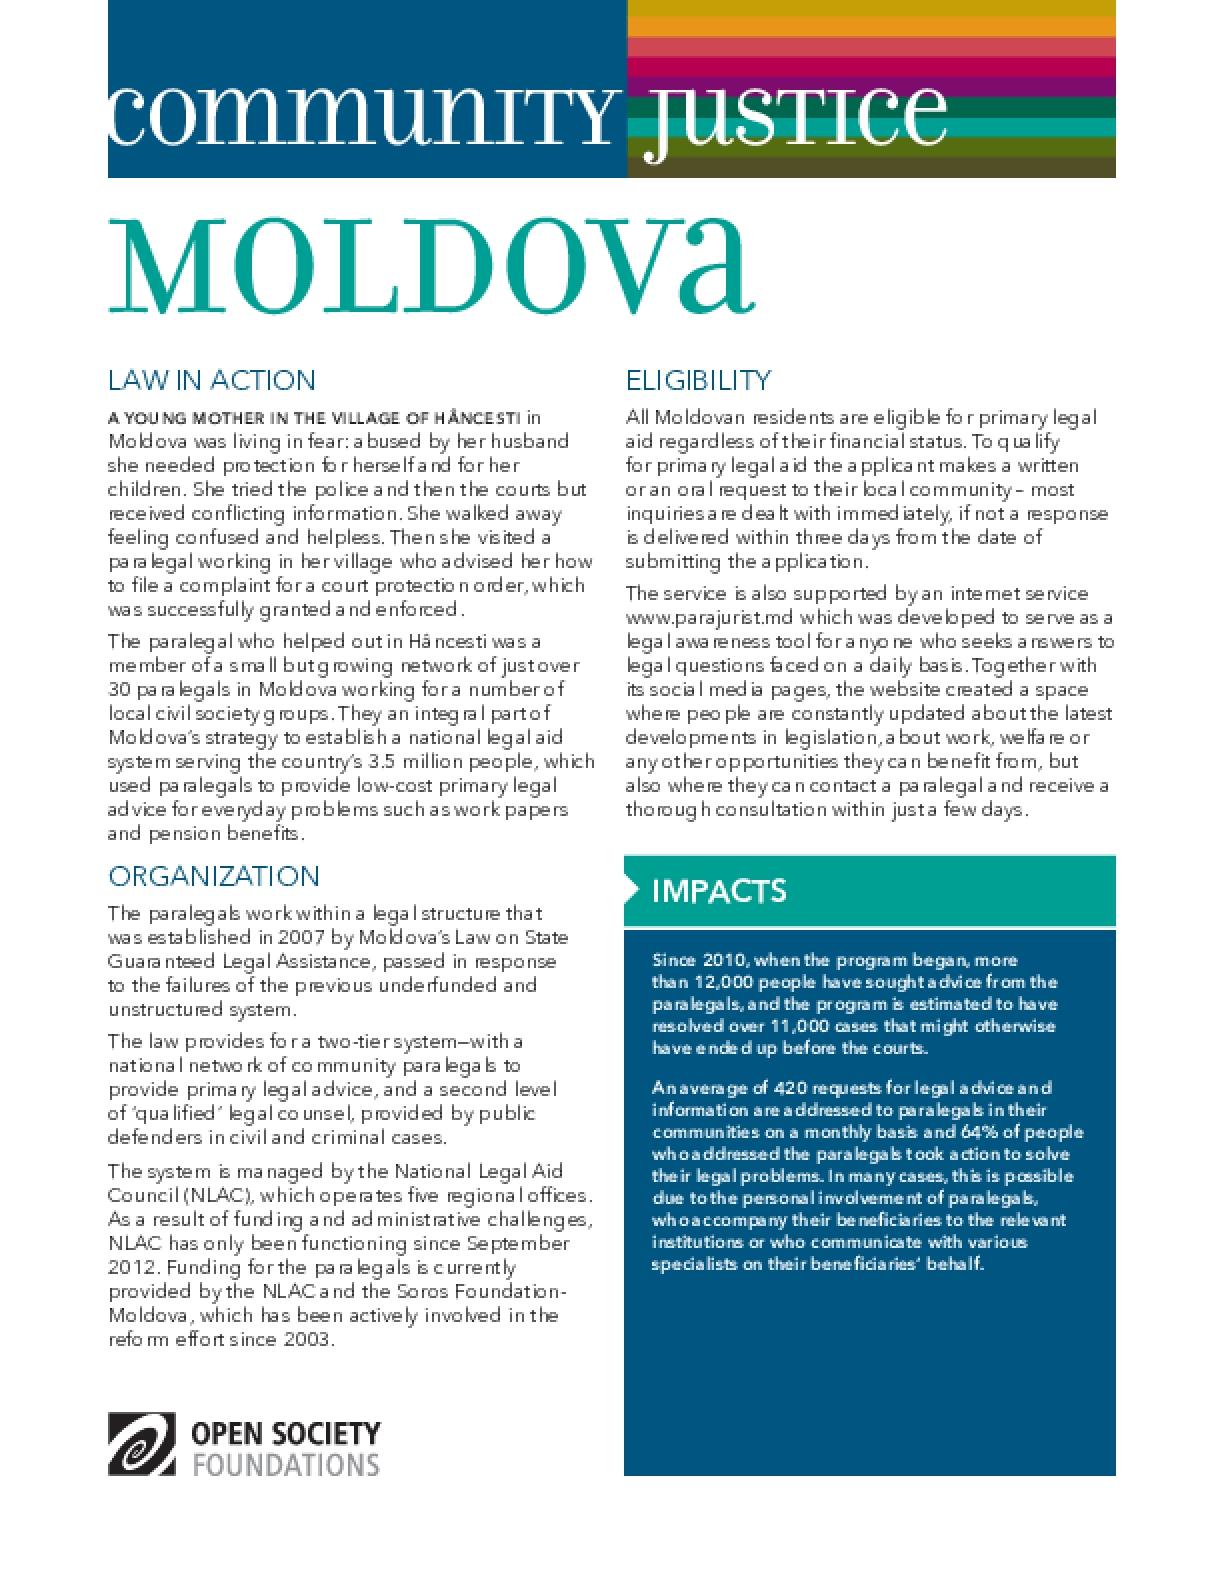 Community Justice Moldova